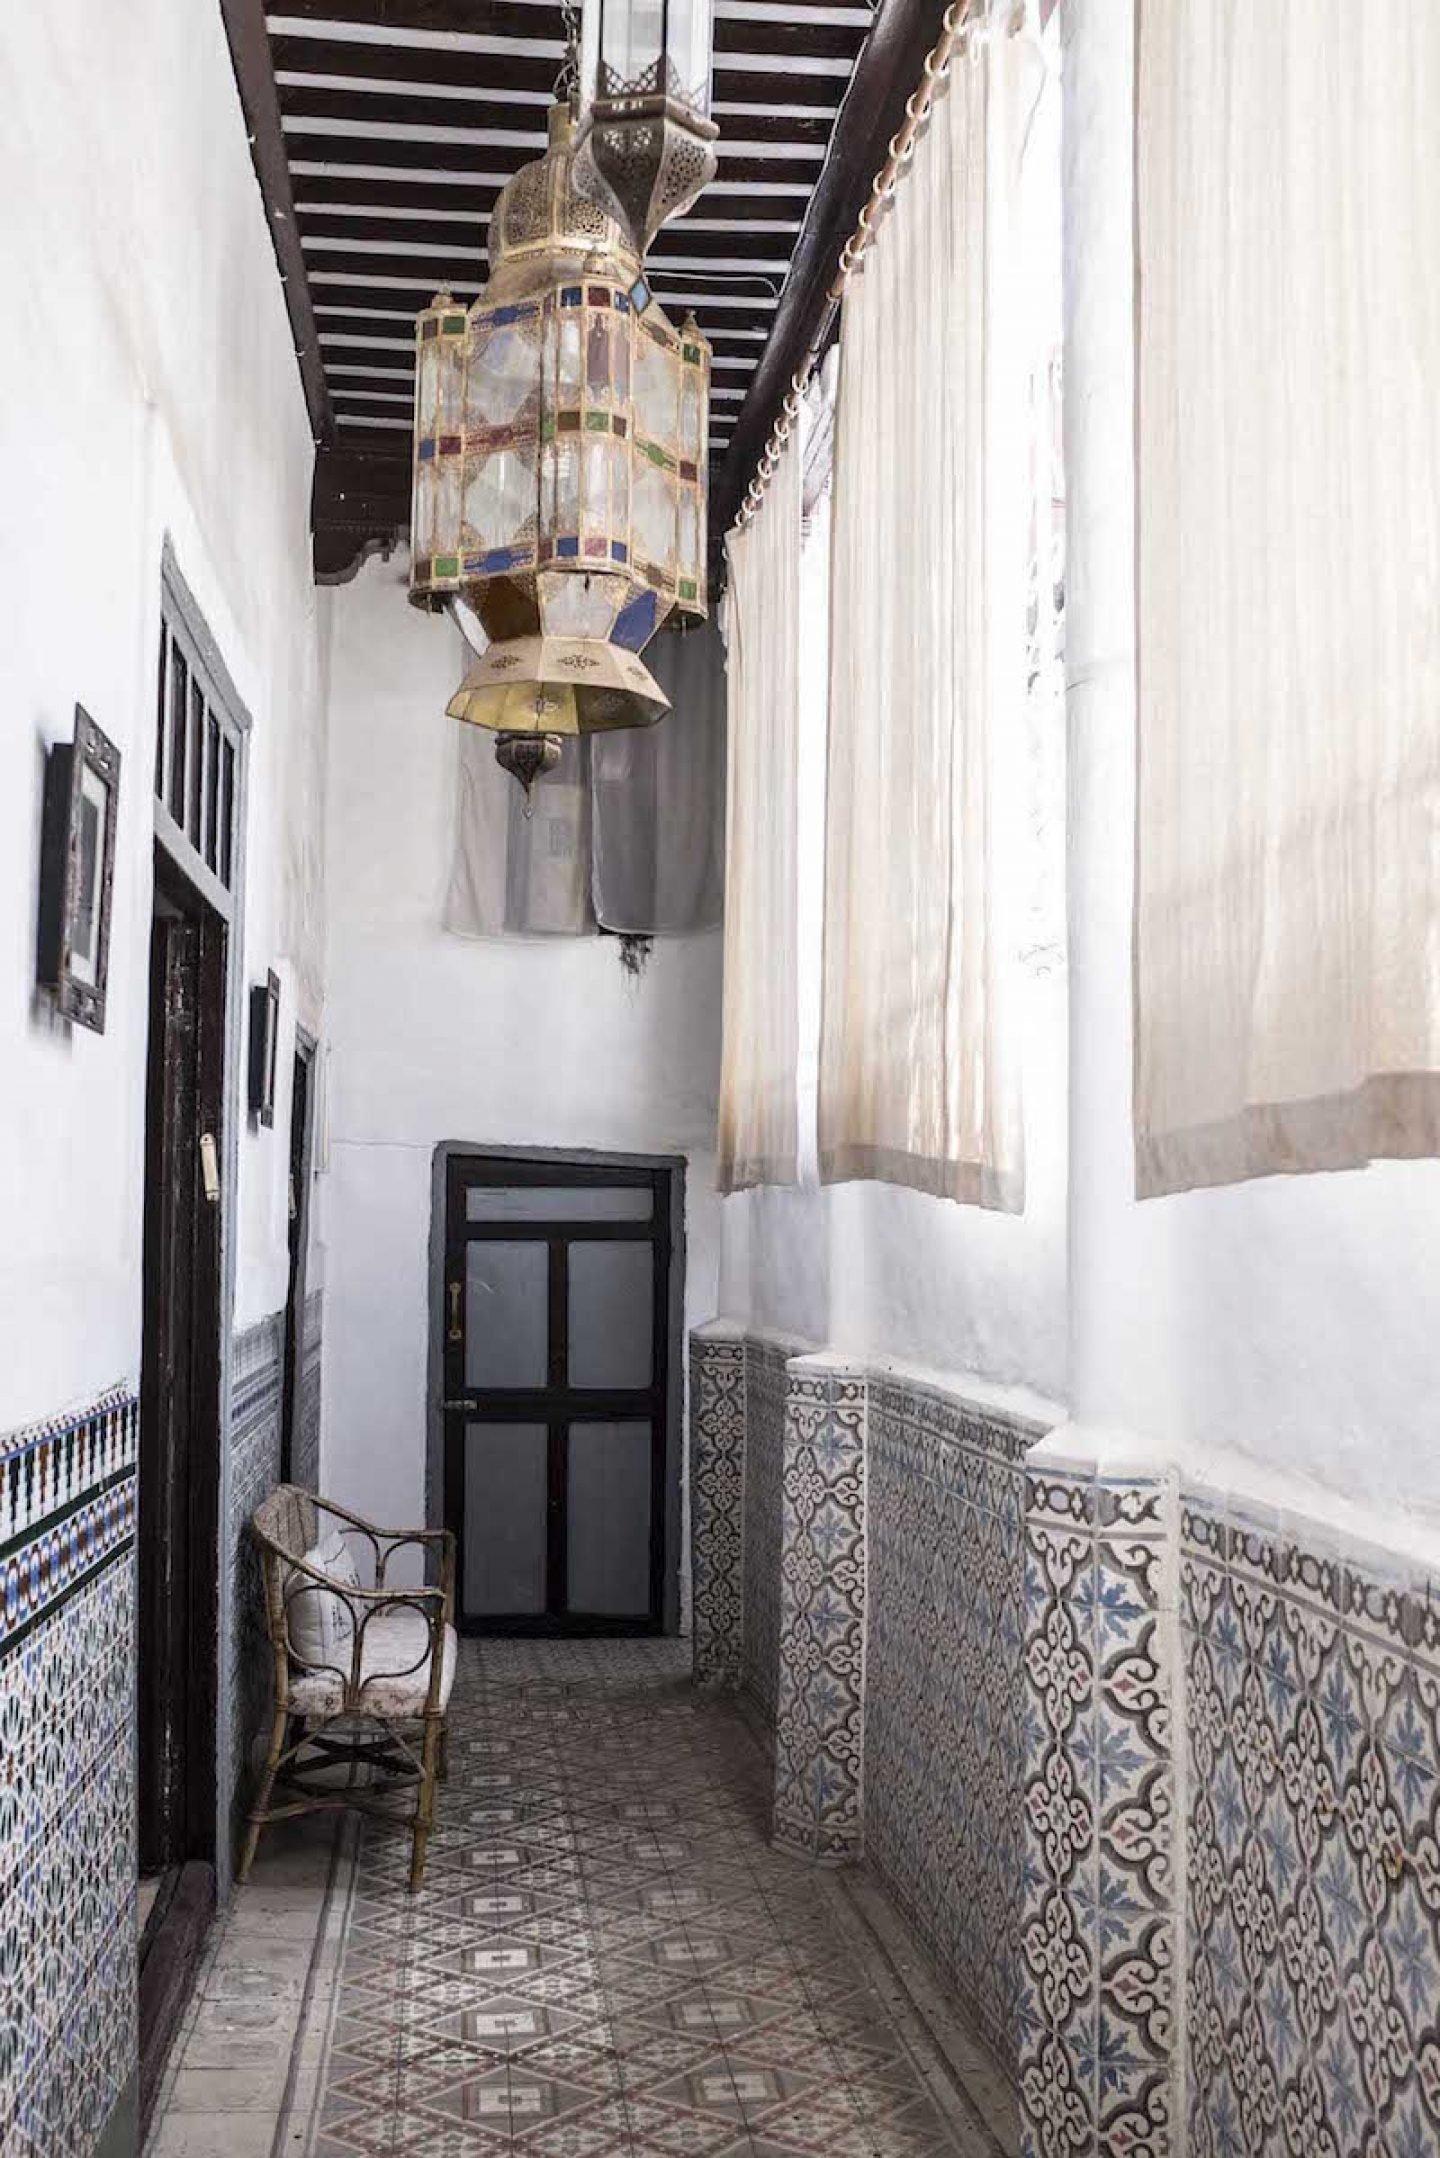 Essauoira, MoroccoGnaoua Festival